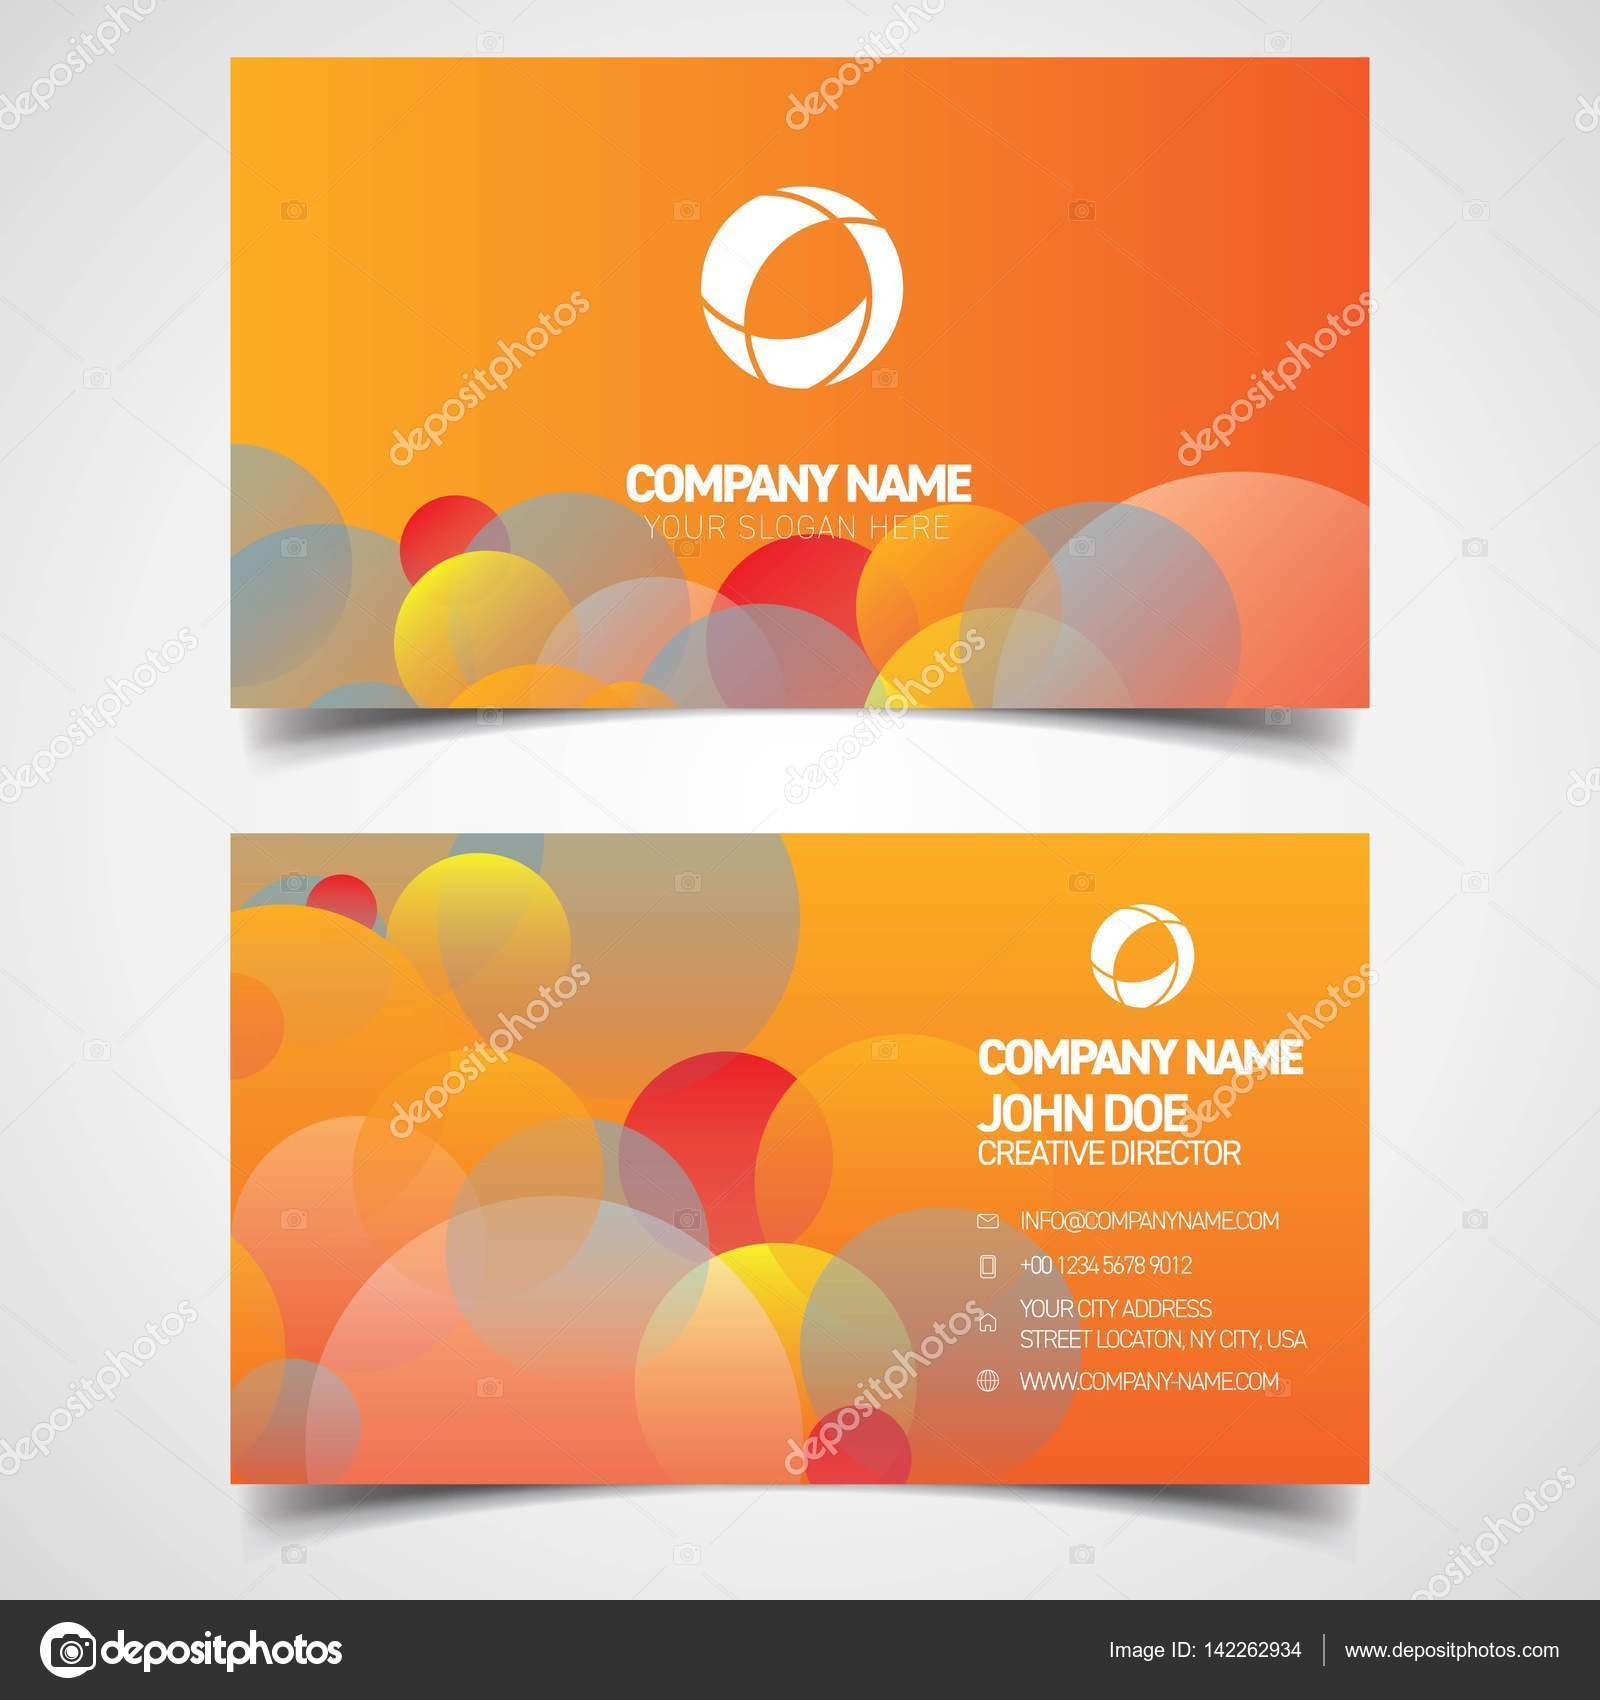 john doe business card orange stock vector a prodesign481 gmail